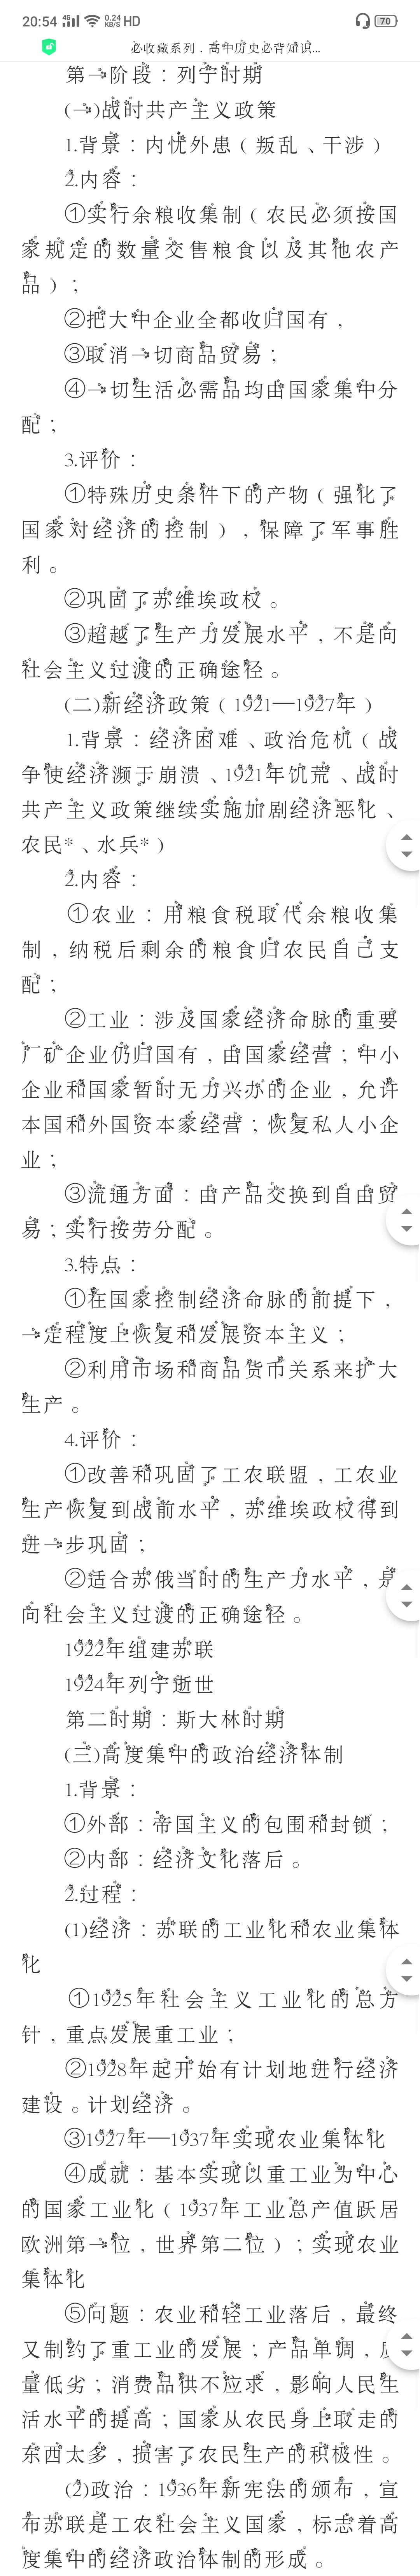 Screenshot_2019-07-26-20-55-15-30.png